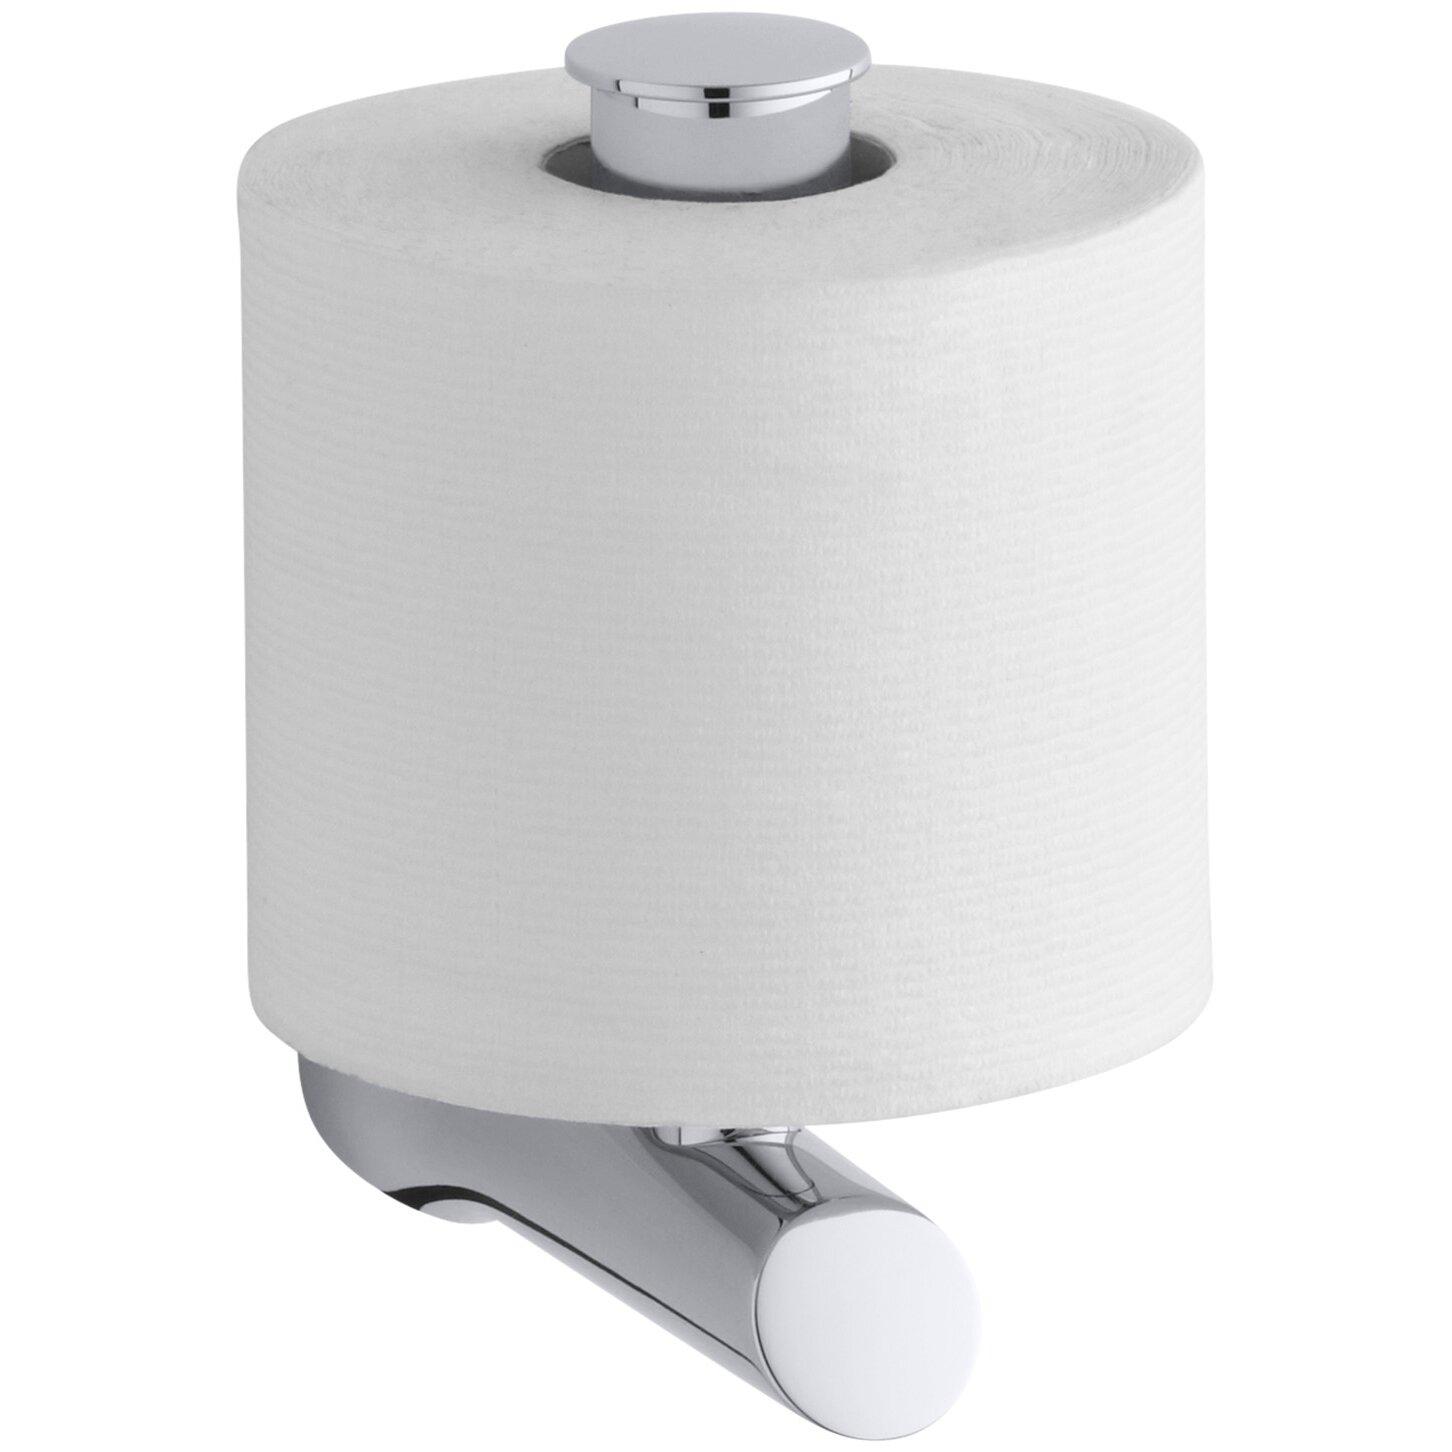 kohler toobi vertical toilet tissue holder reviews wayfair. Black Bedroom Furniture Sets. Home Design Ideas